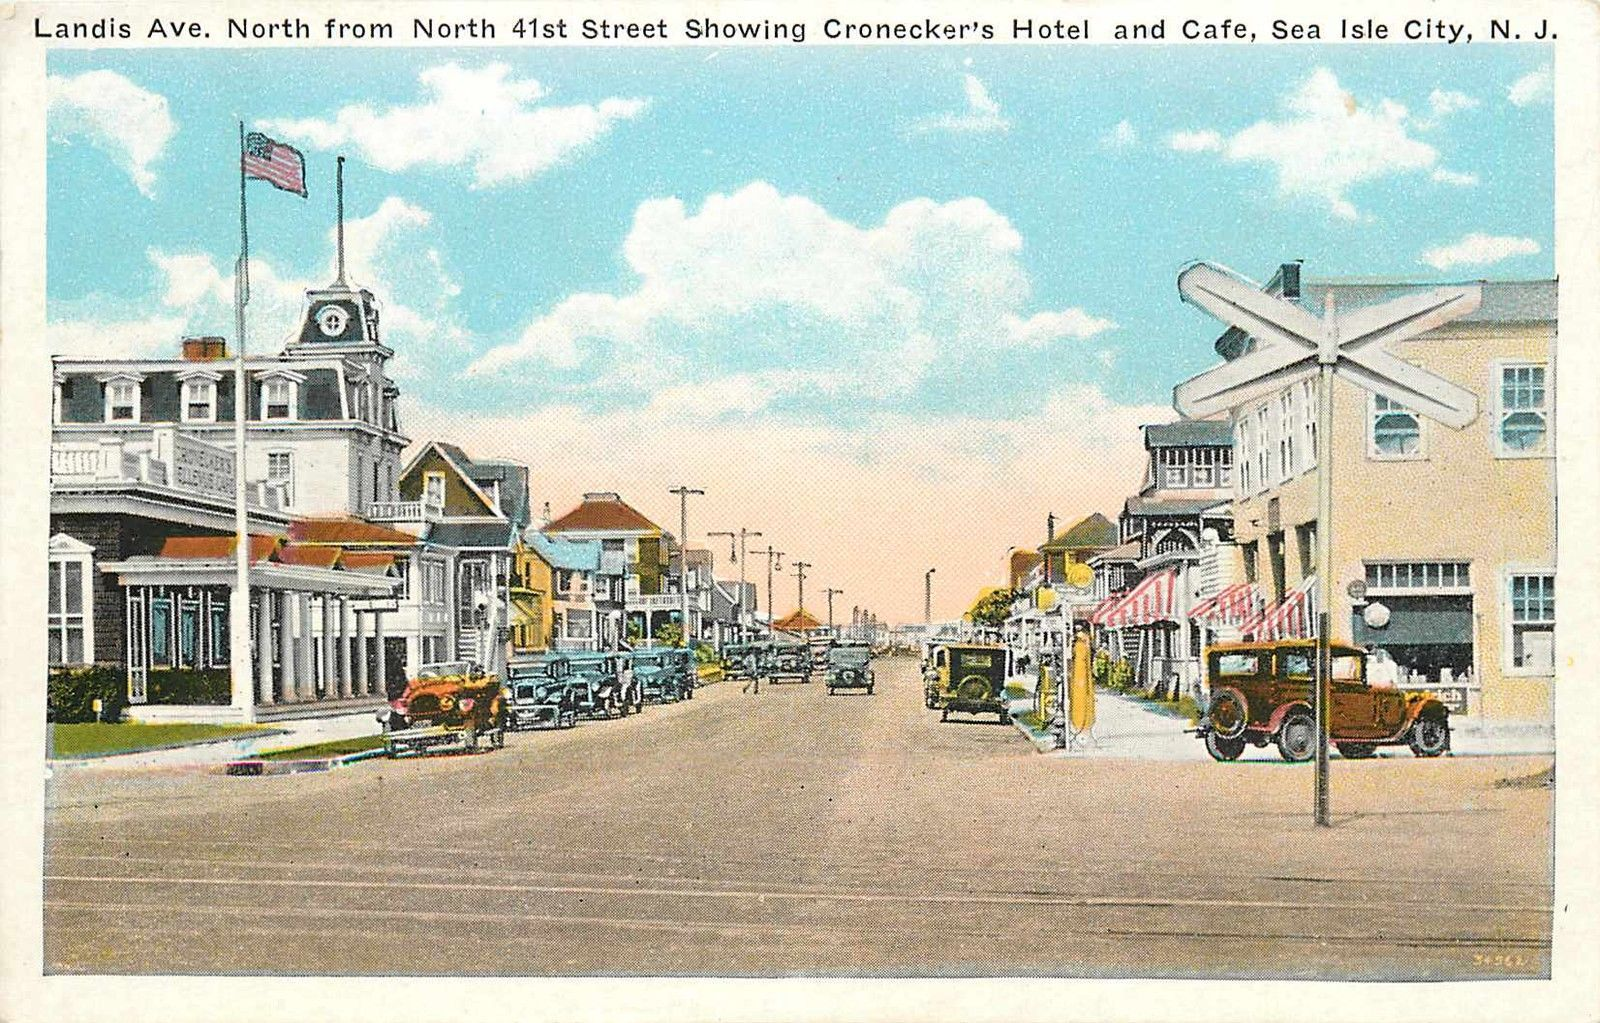 Cronecker S Hotel Landis Avenue Sea Isle City Nj Scarce Old Postcard 1920